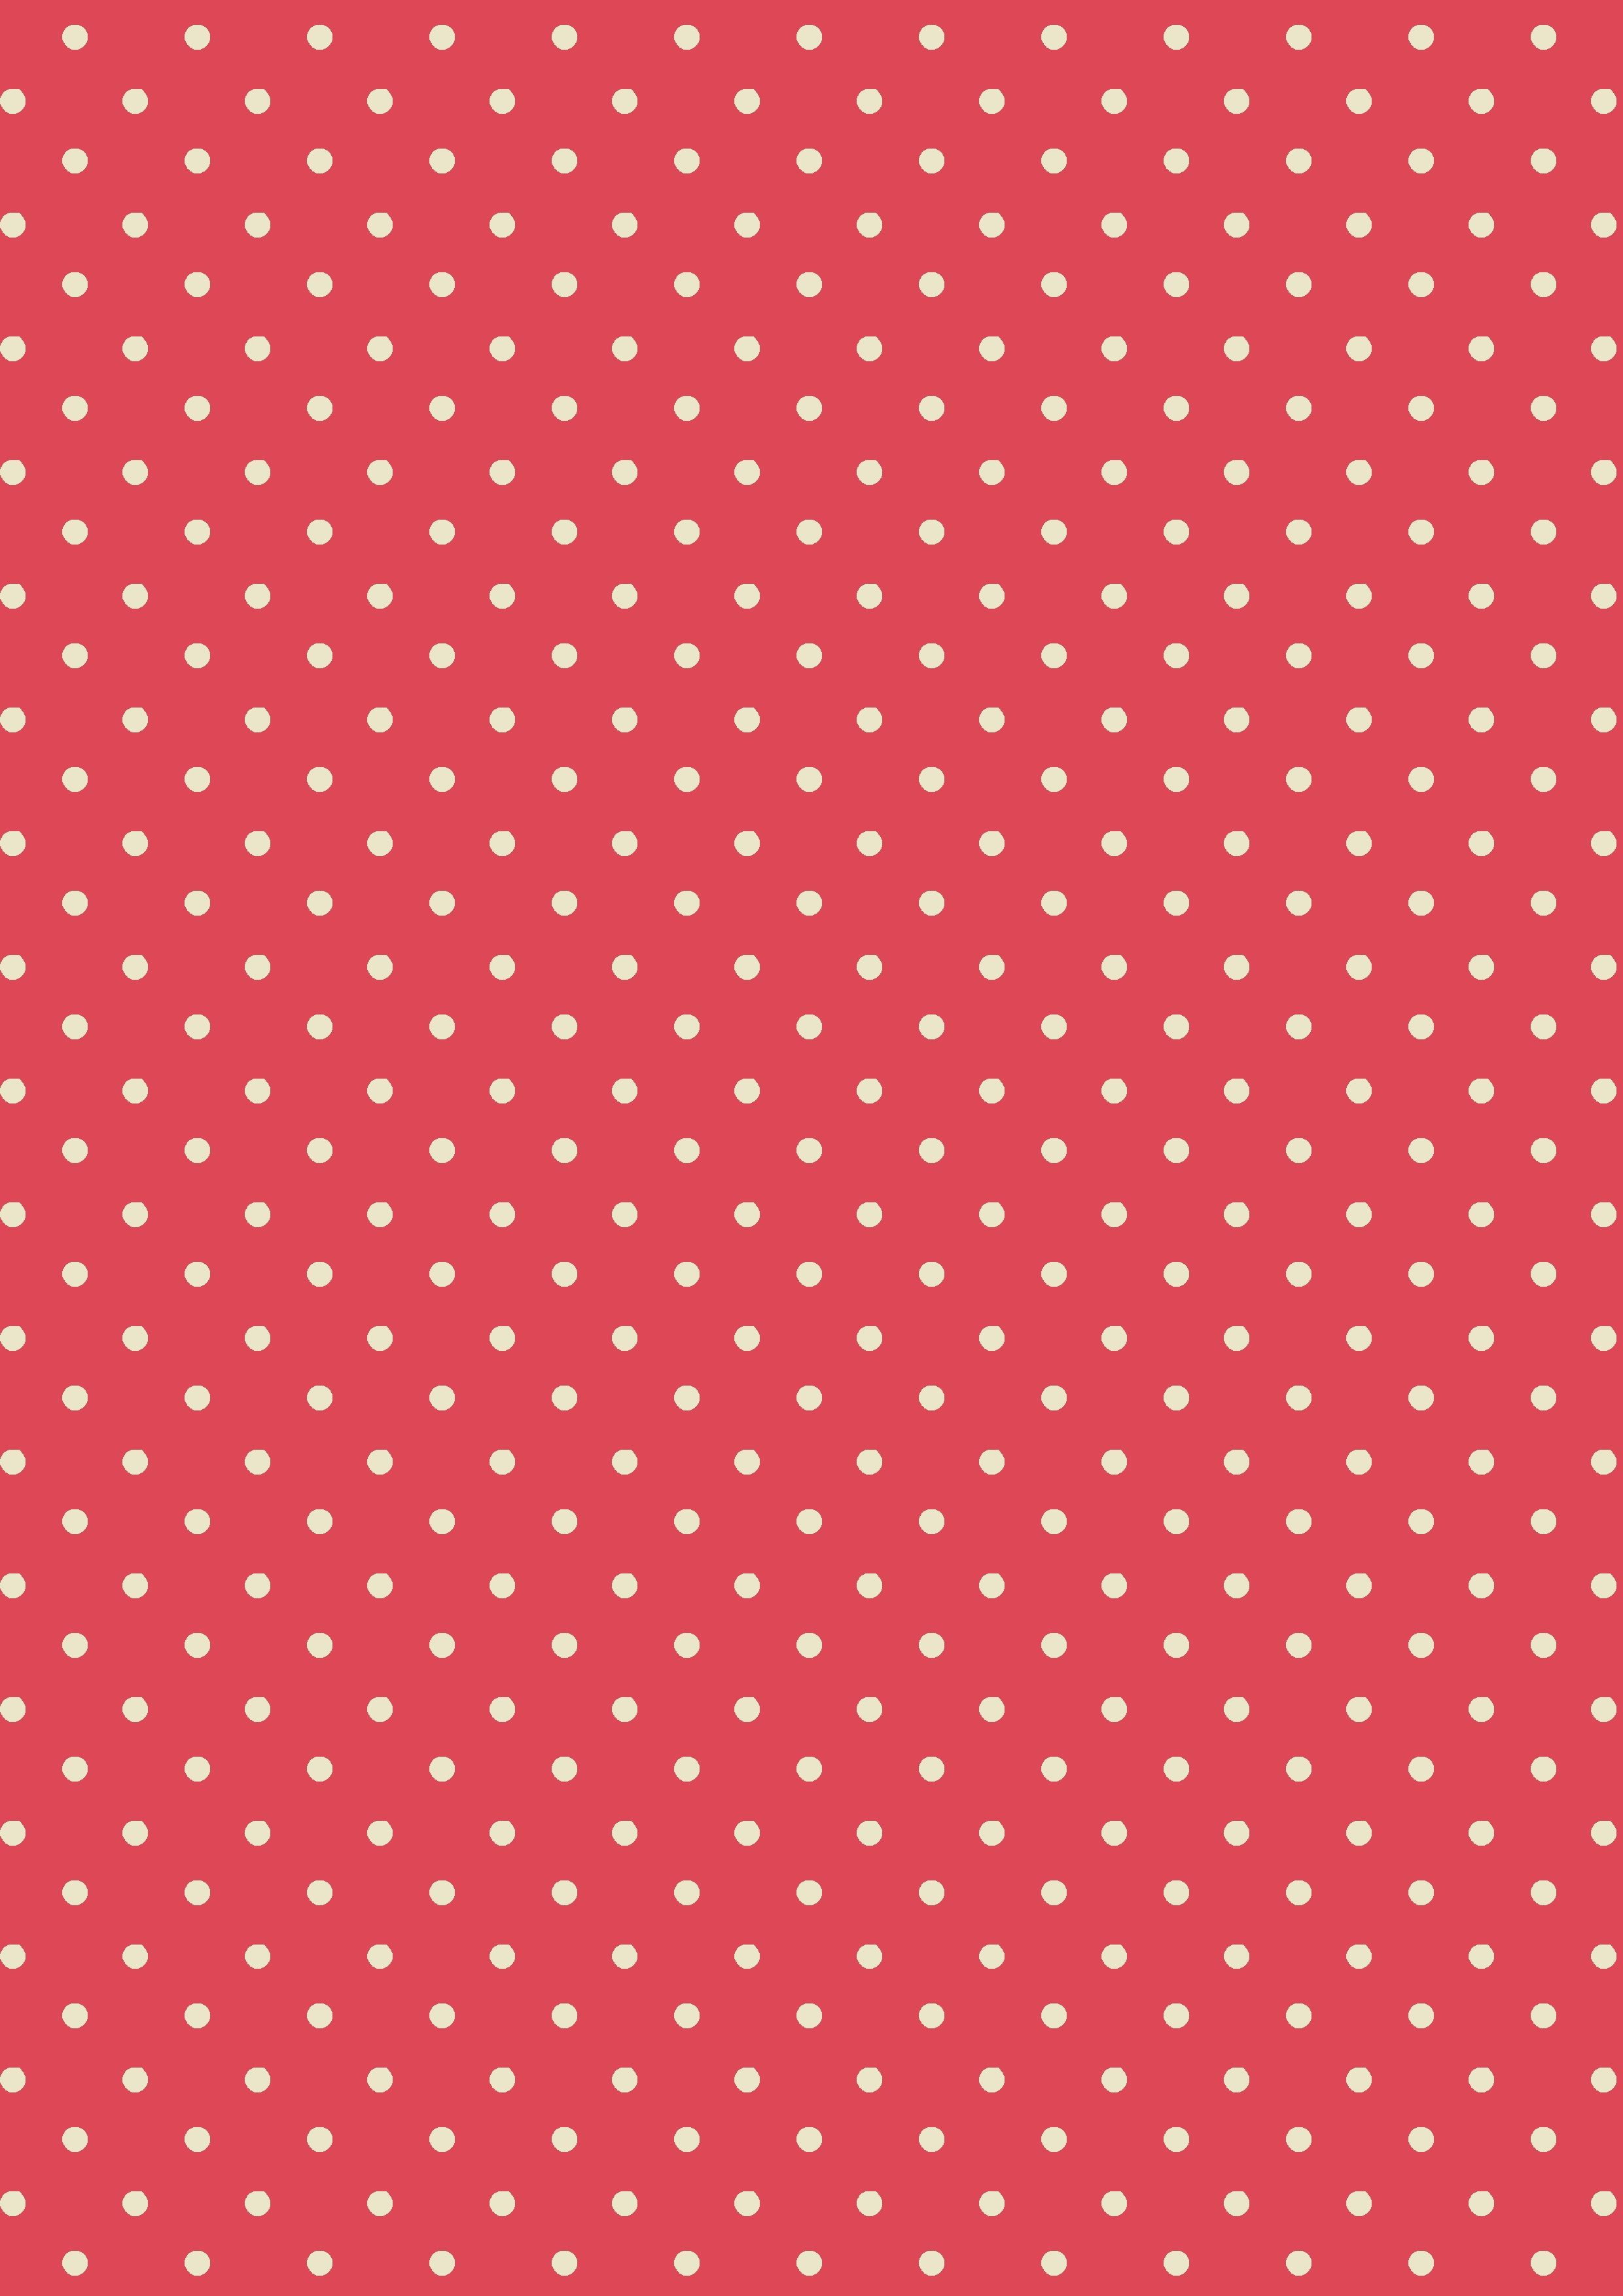 Mini Dot Poppy Red | Cath Kidston classic polkadot print ...